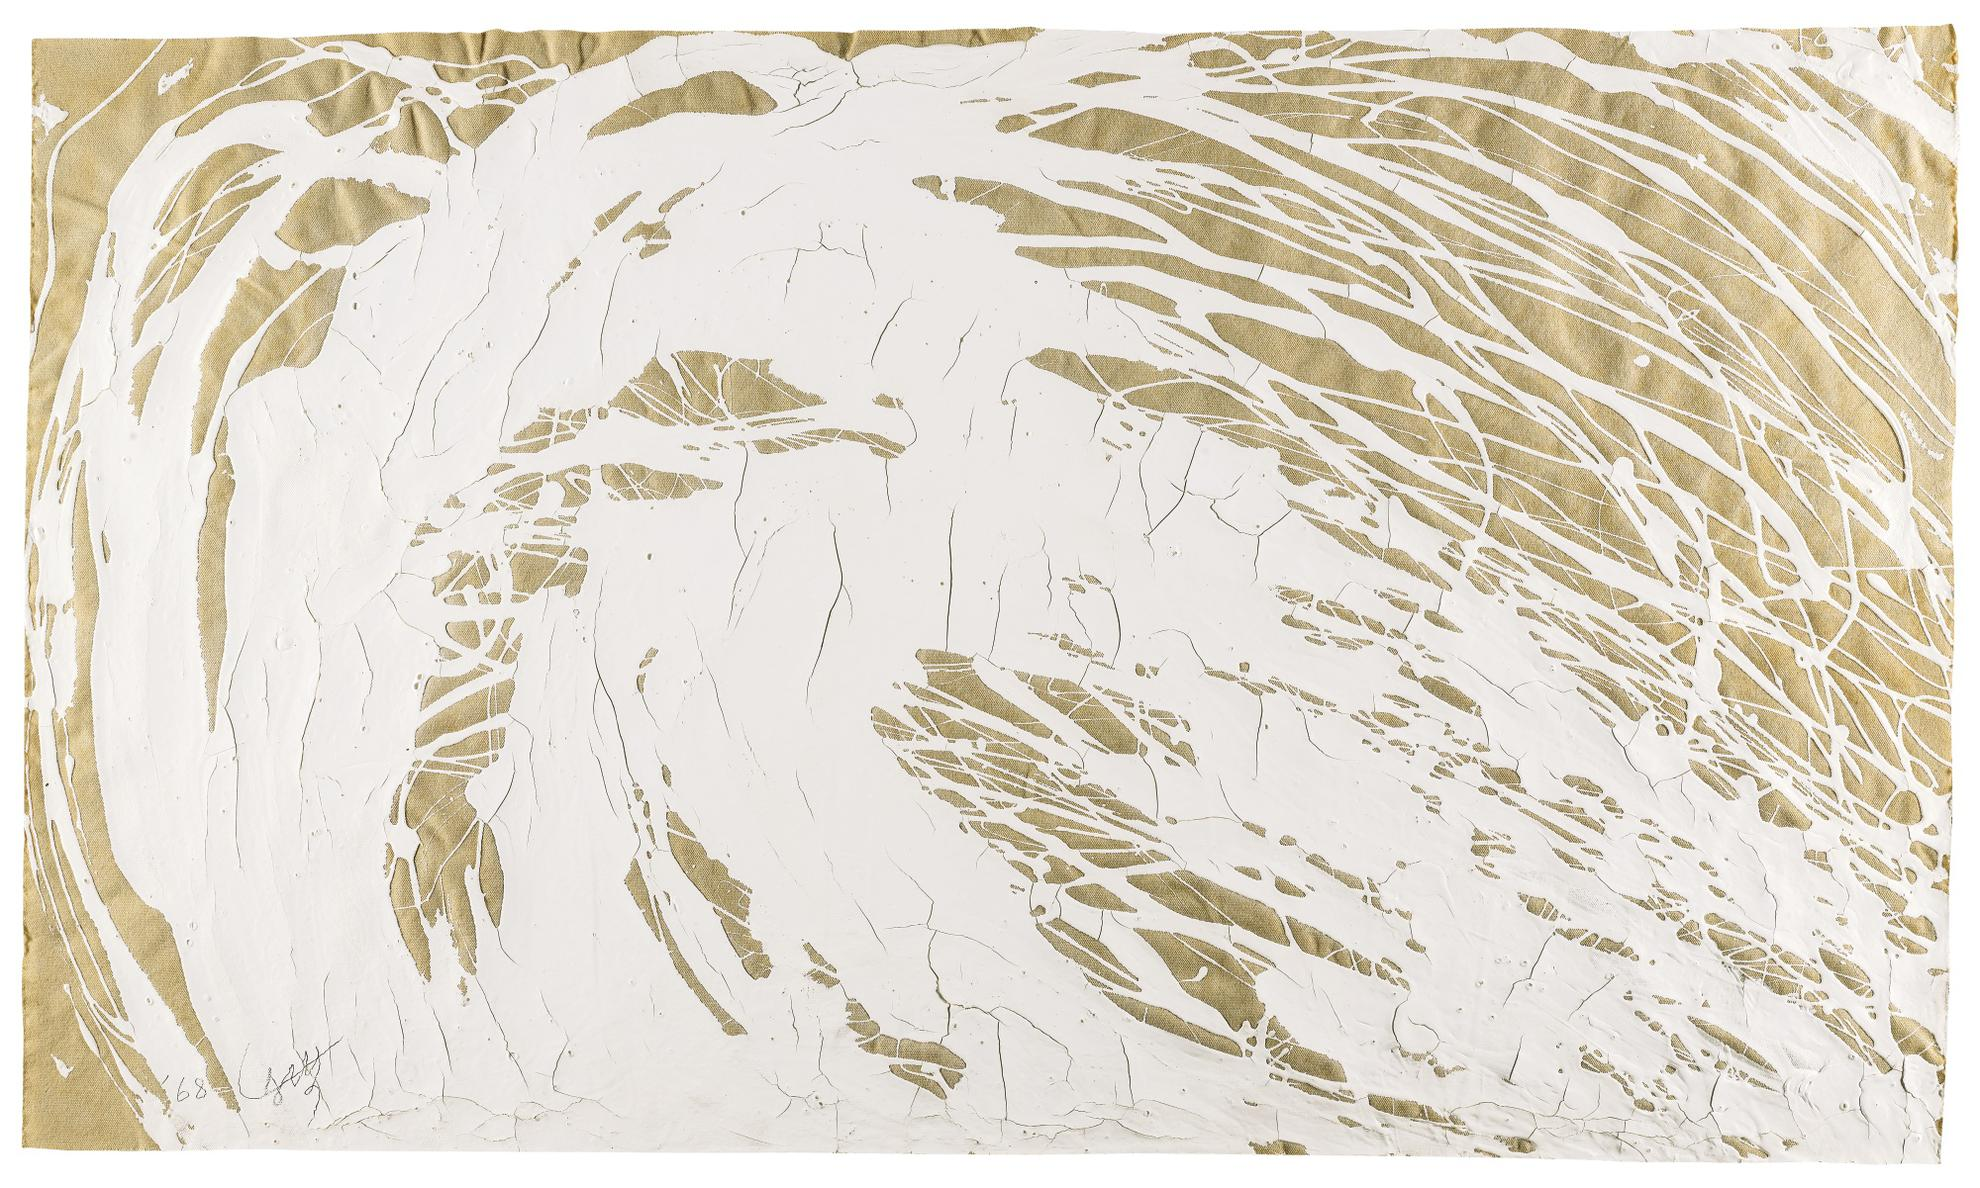 Seung-Taek Lee - Untitled-1968